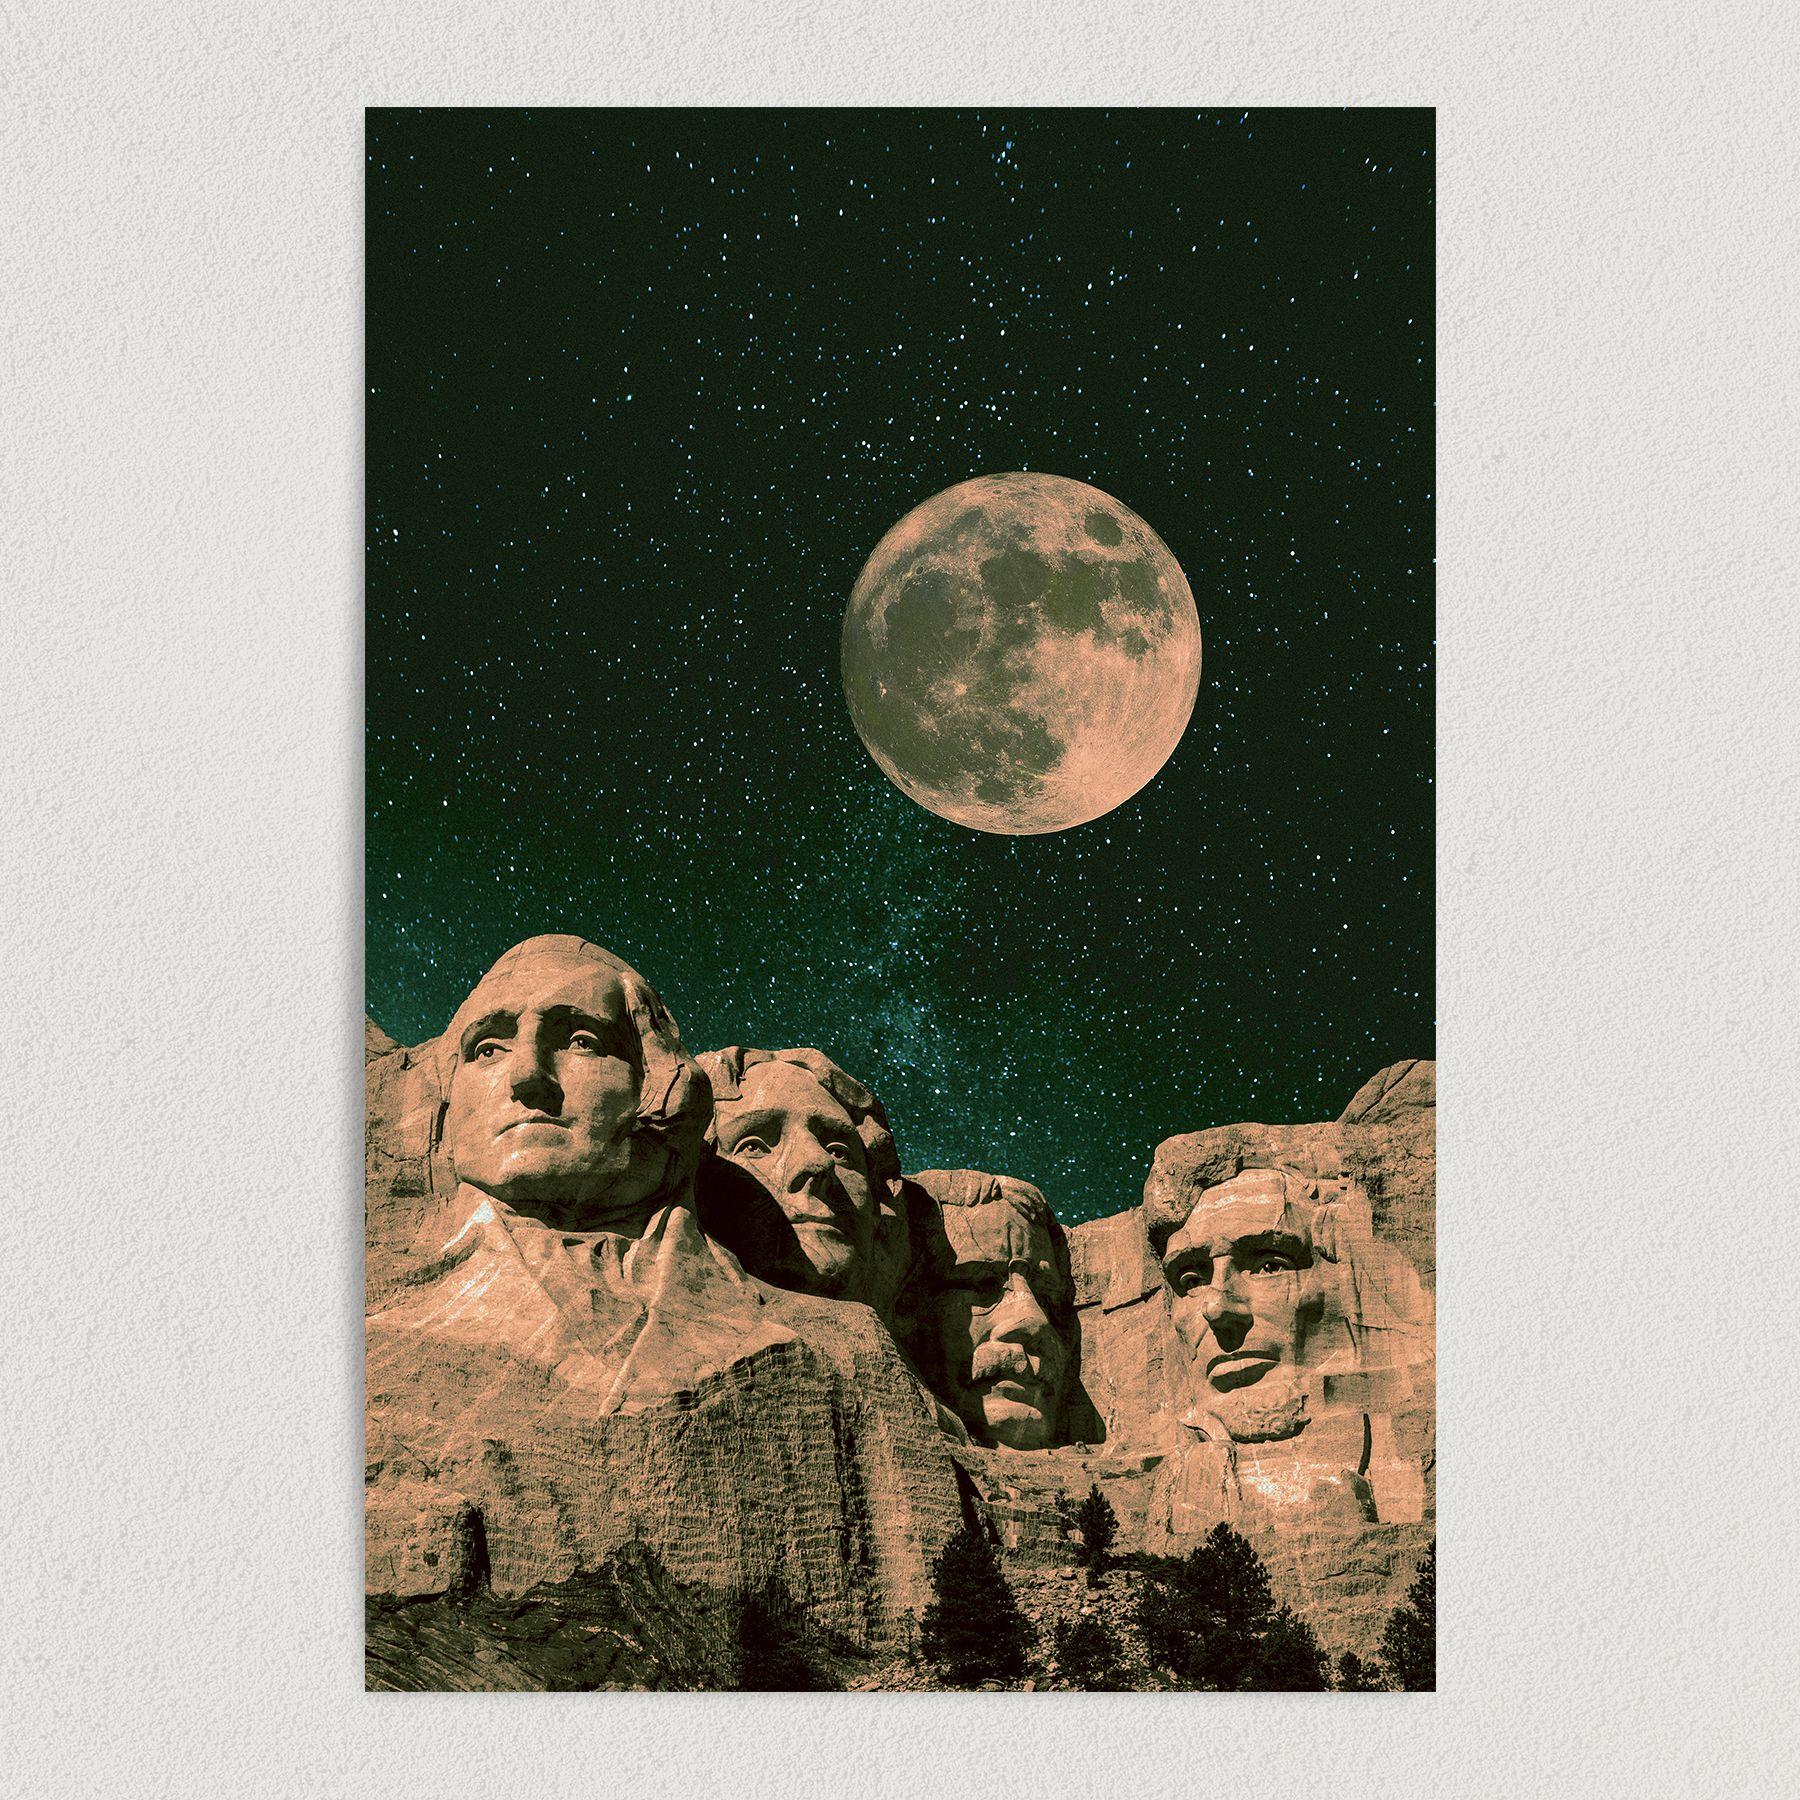 Mount Rushmore South Dakota Abstract Travel Art Print Poster 12″ x 18″ Wall Art AB2136